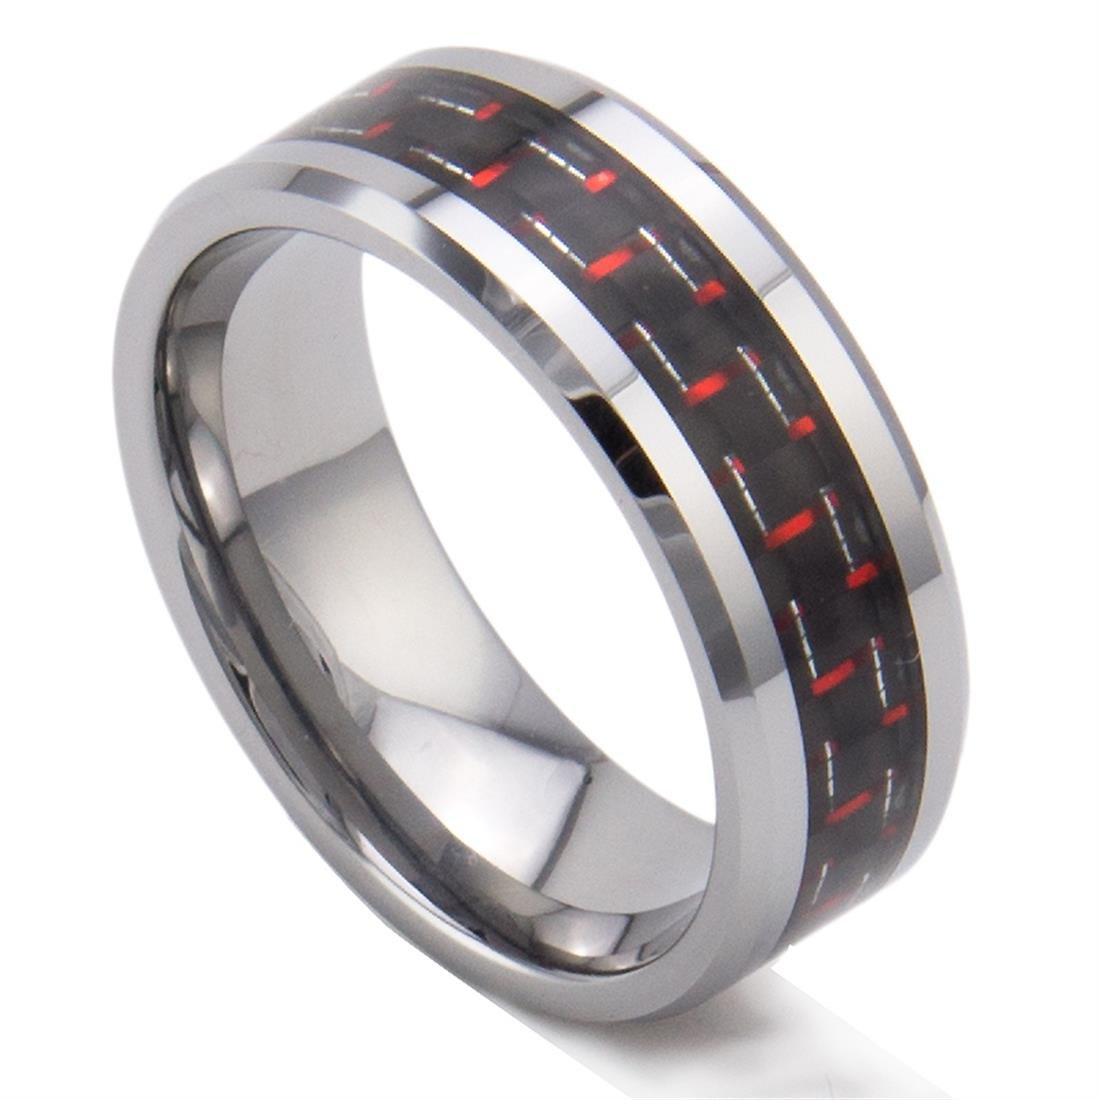 King Will 8Mm Tungsten Carbide Red Black Carbon Fiber Inlay Men's Ring Weddin.. 14